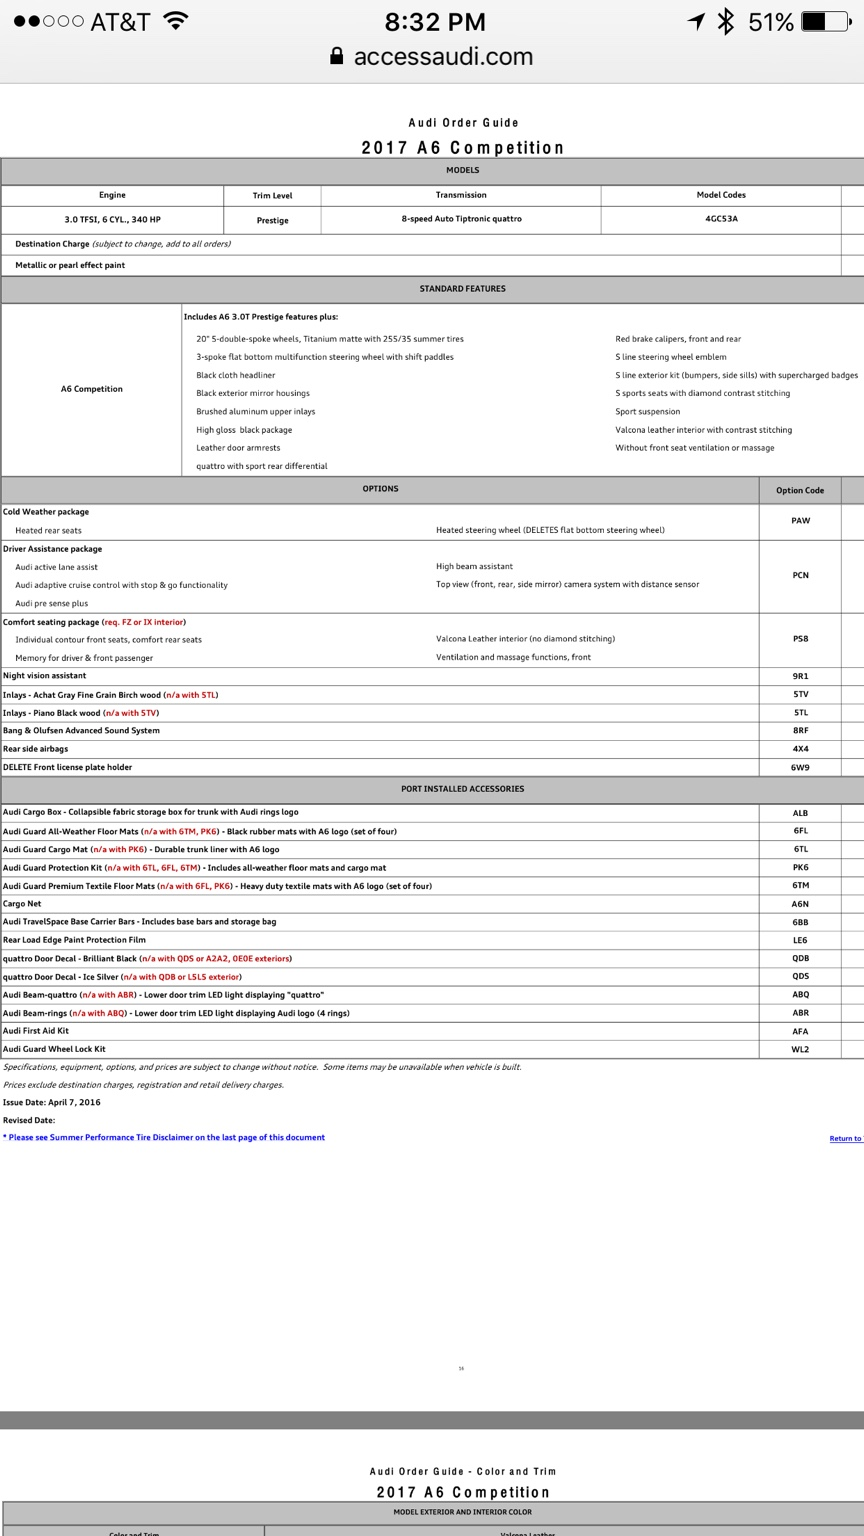 2018 Vw Gti Order Guide >> 2018 Audi Q5 Order Guide | Motavera.com